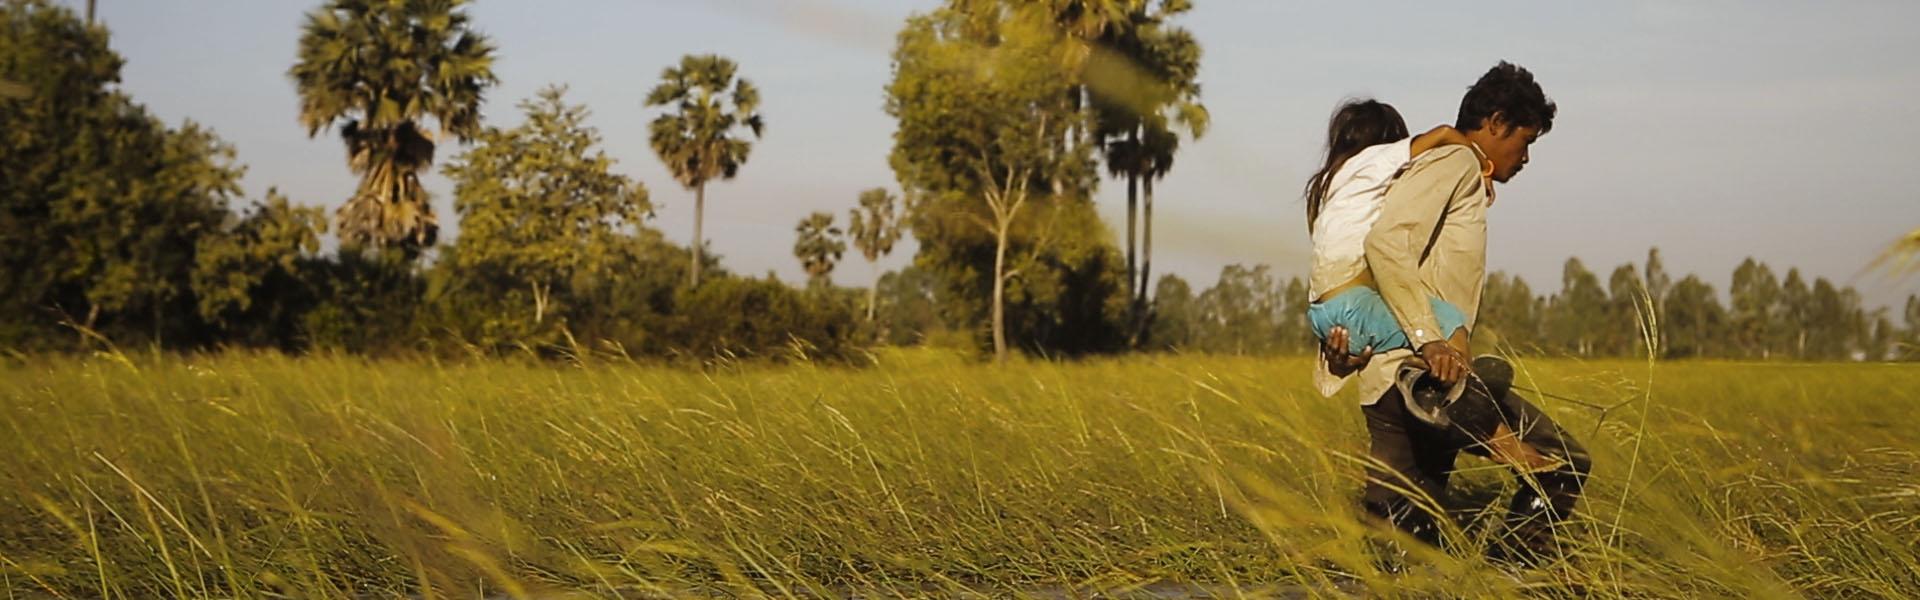 Fotograma del documental Break in. The story of a Cambodian street child.